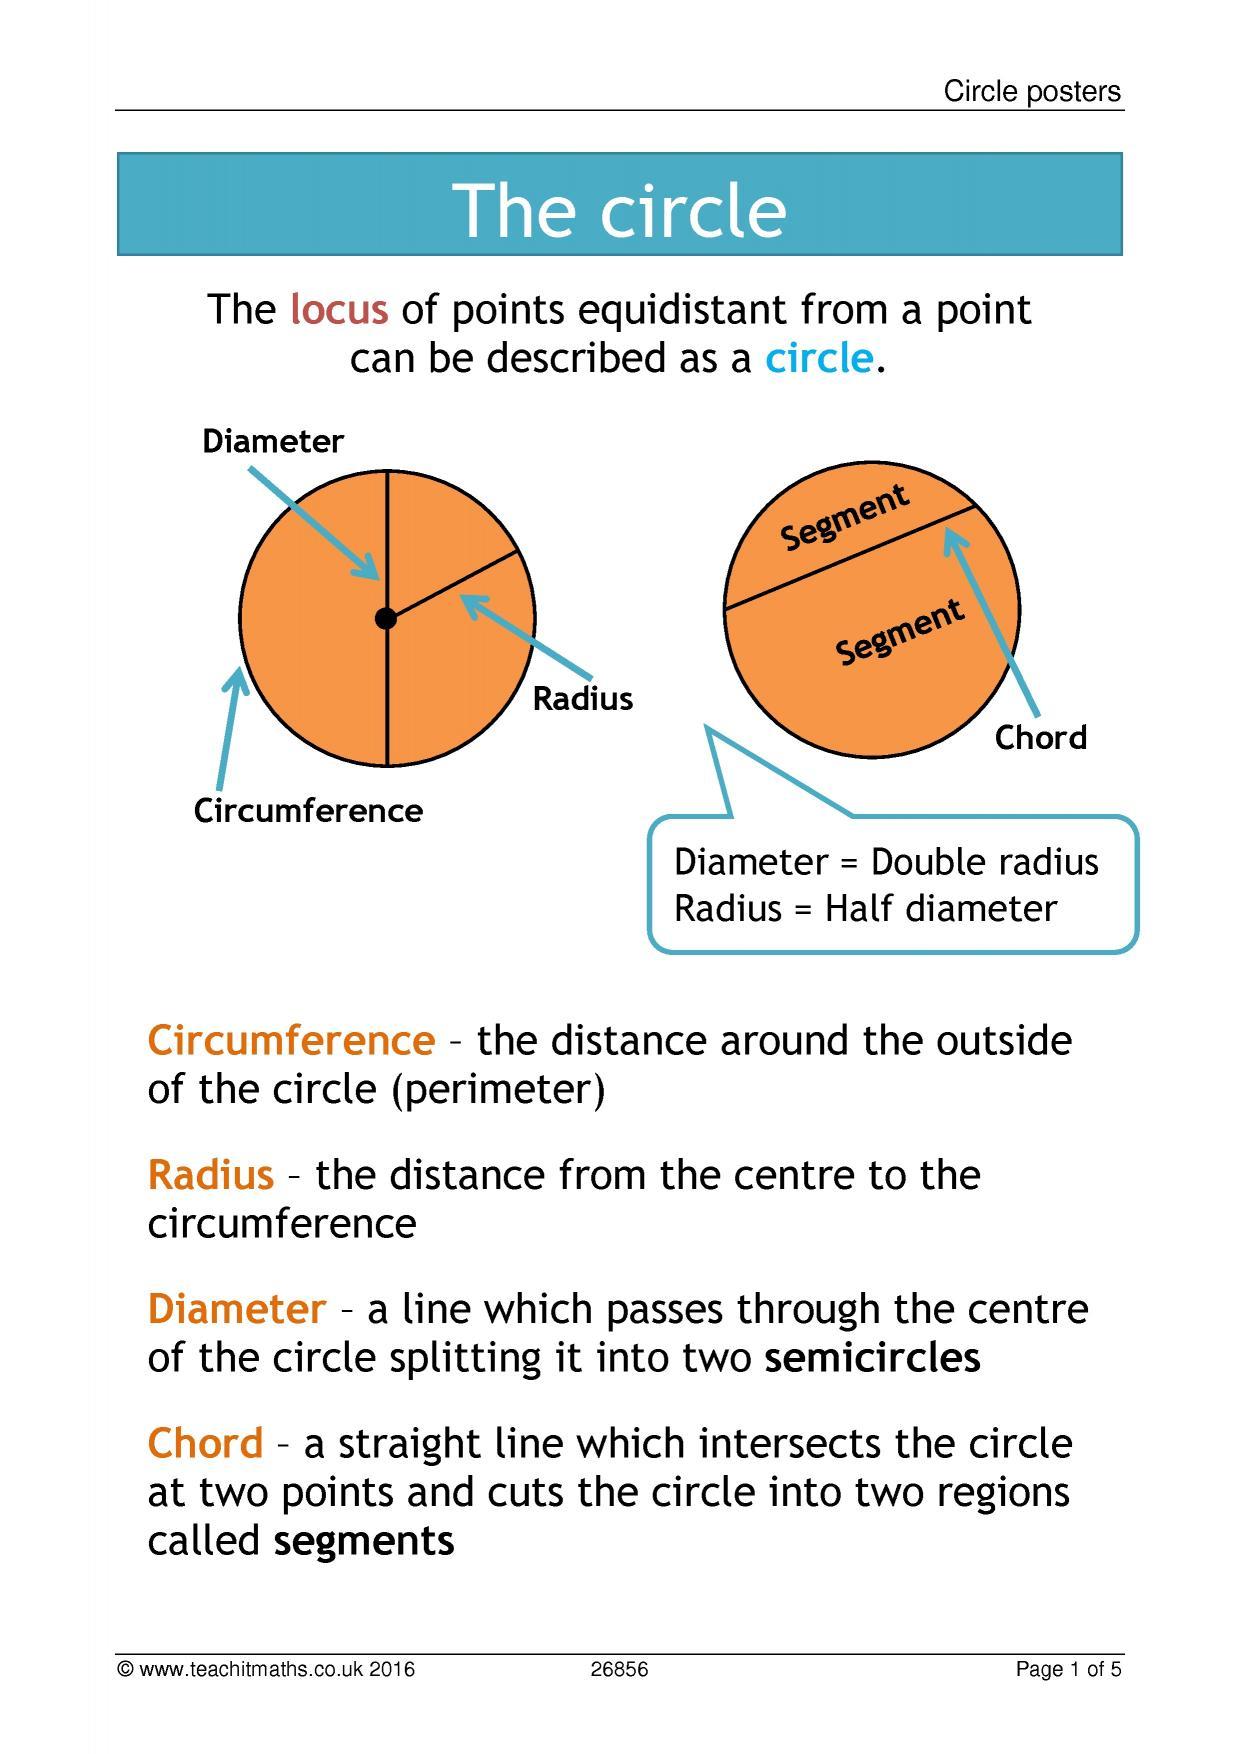 Worksheets Circumference Of A Circle Worksheet 100 circumference of a circle worksheet 8 tips for crafting circles teachit maths